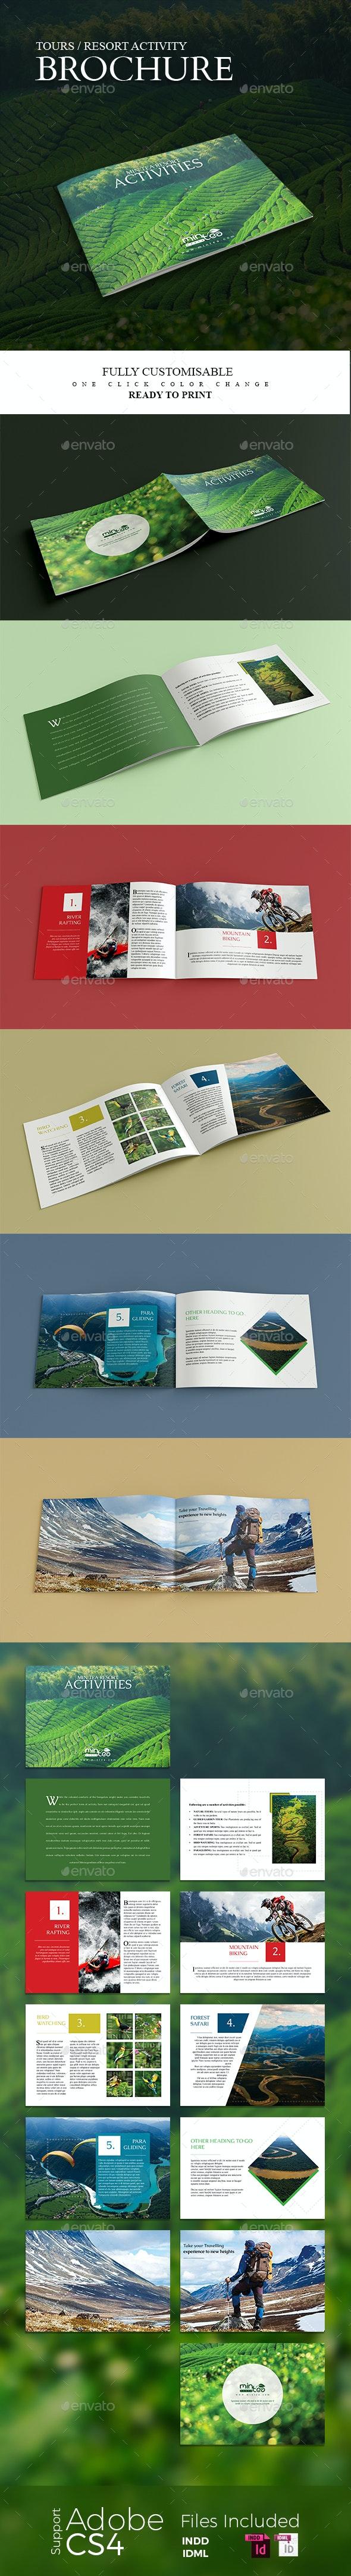 Tours Travels and Resort Activity Brochure - Informational Brochures